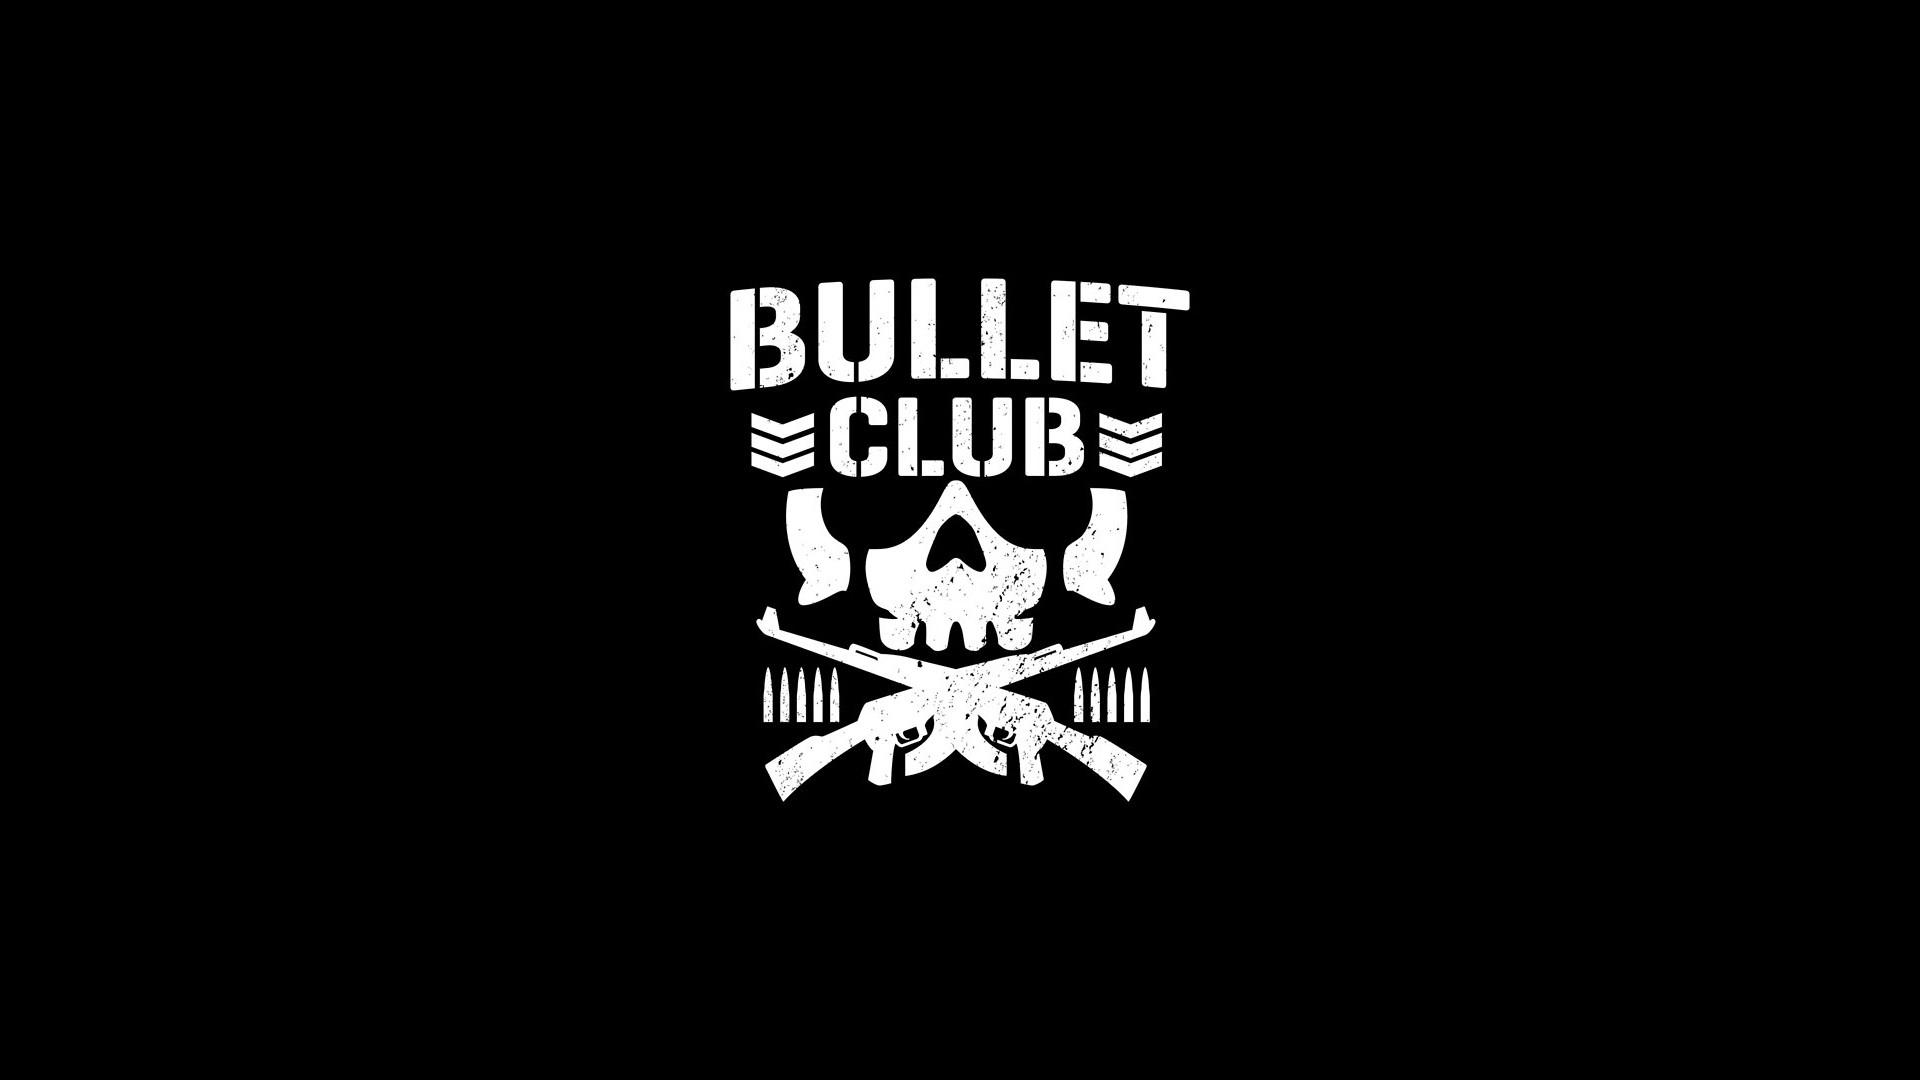 bullet club.jpg …